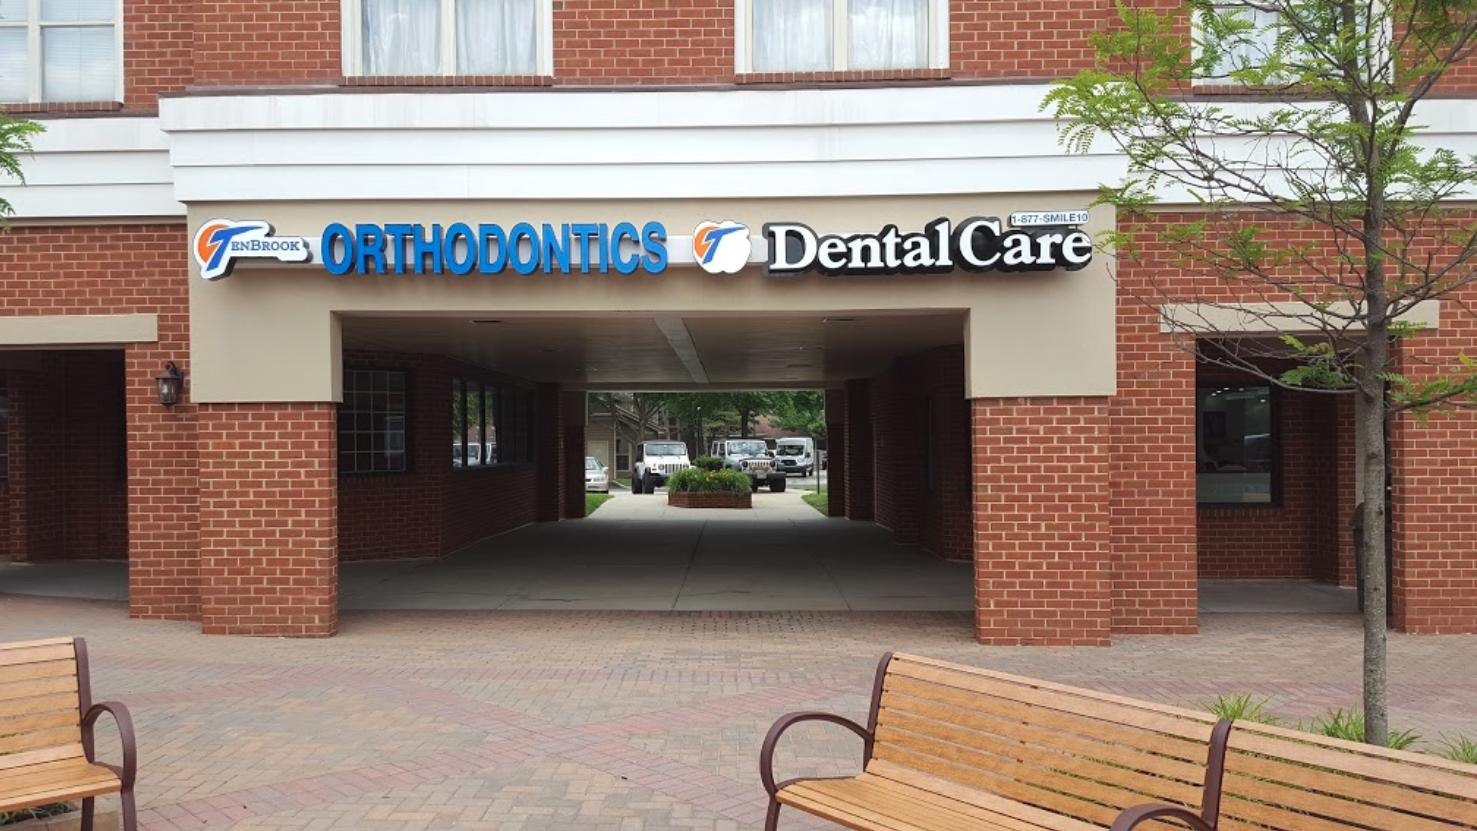 TenBrook Orthodontics image 0